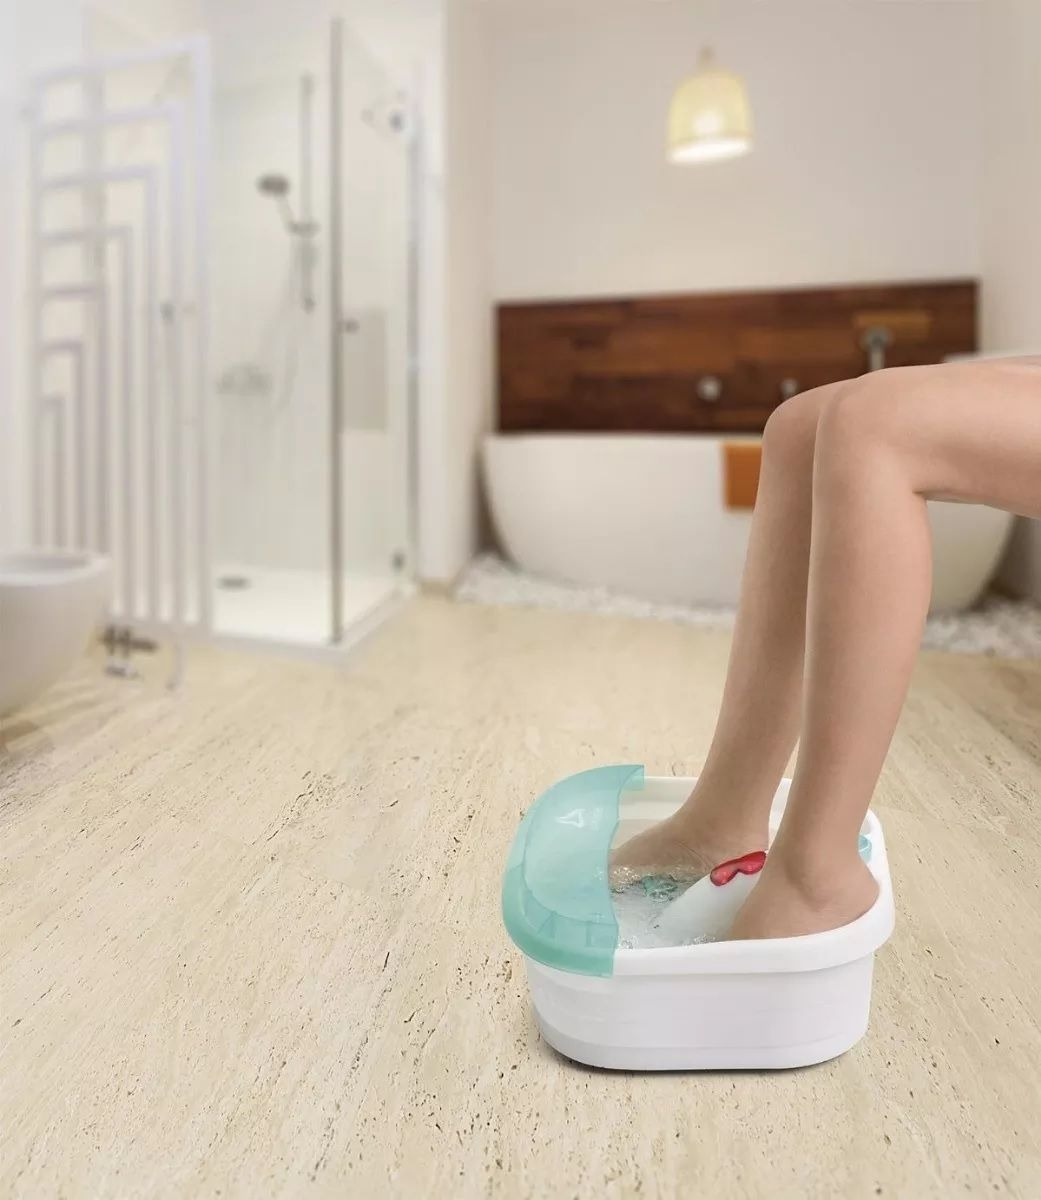 massageador elétrico para os pés